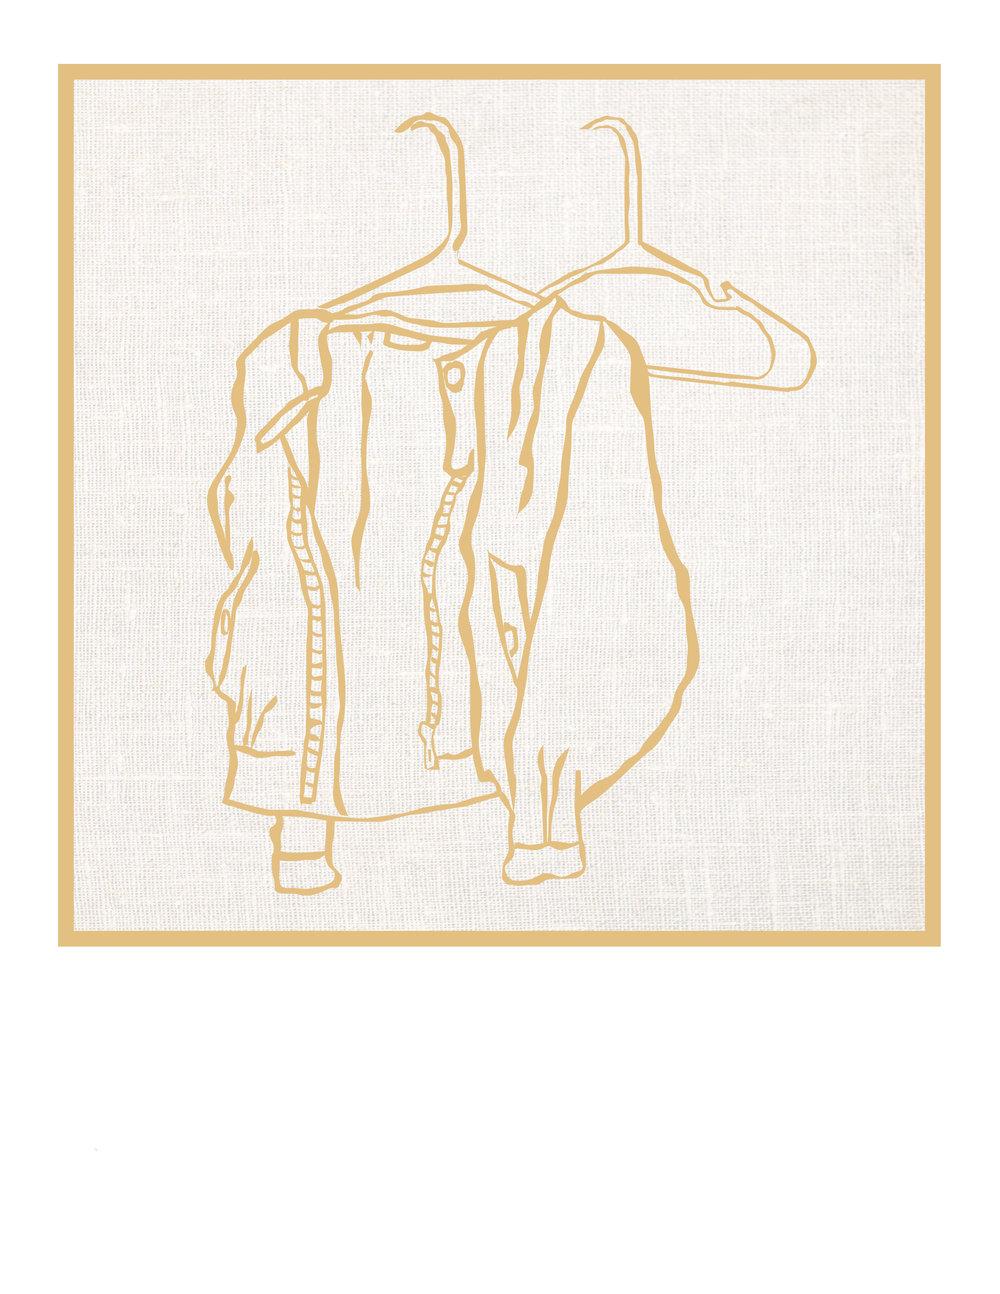 hangerspoloroid.jpg